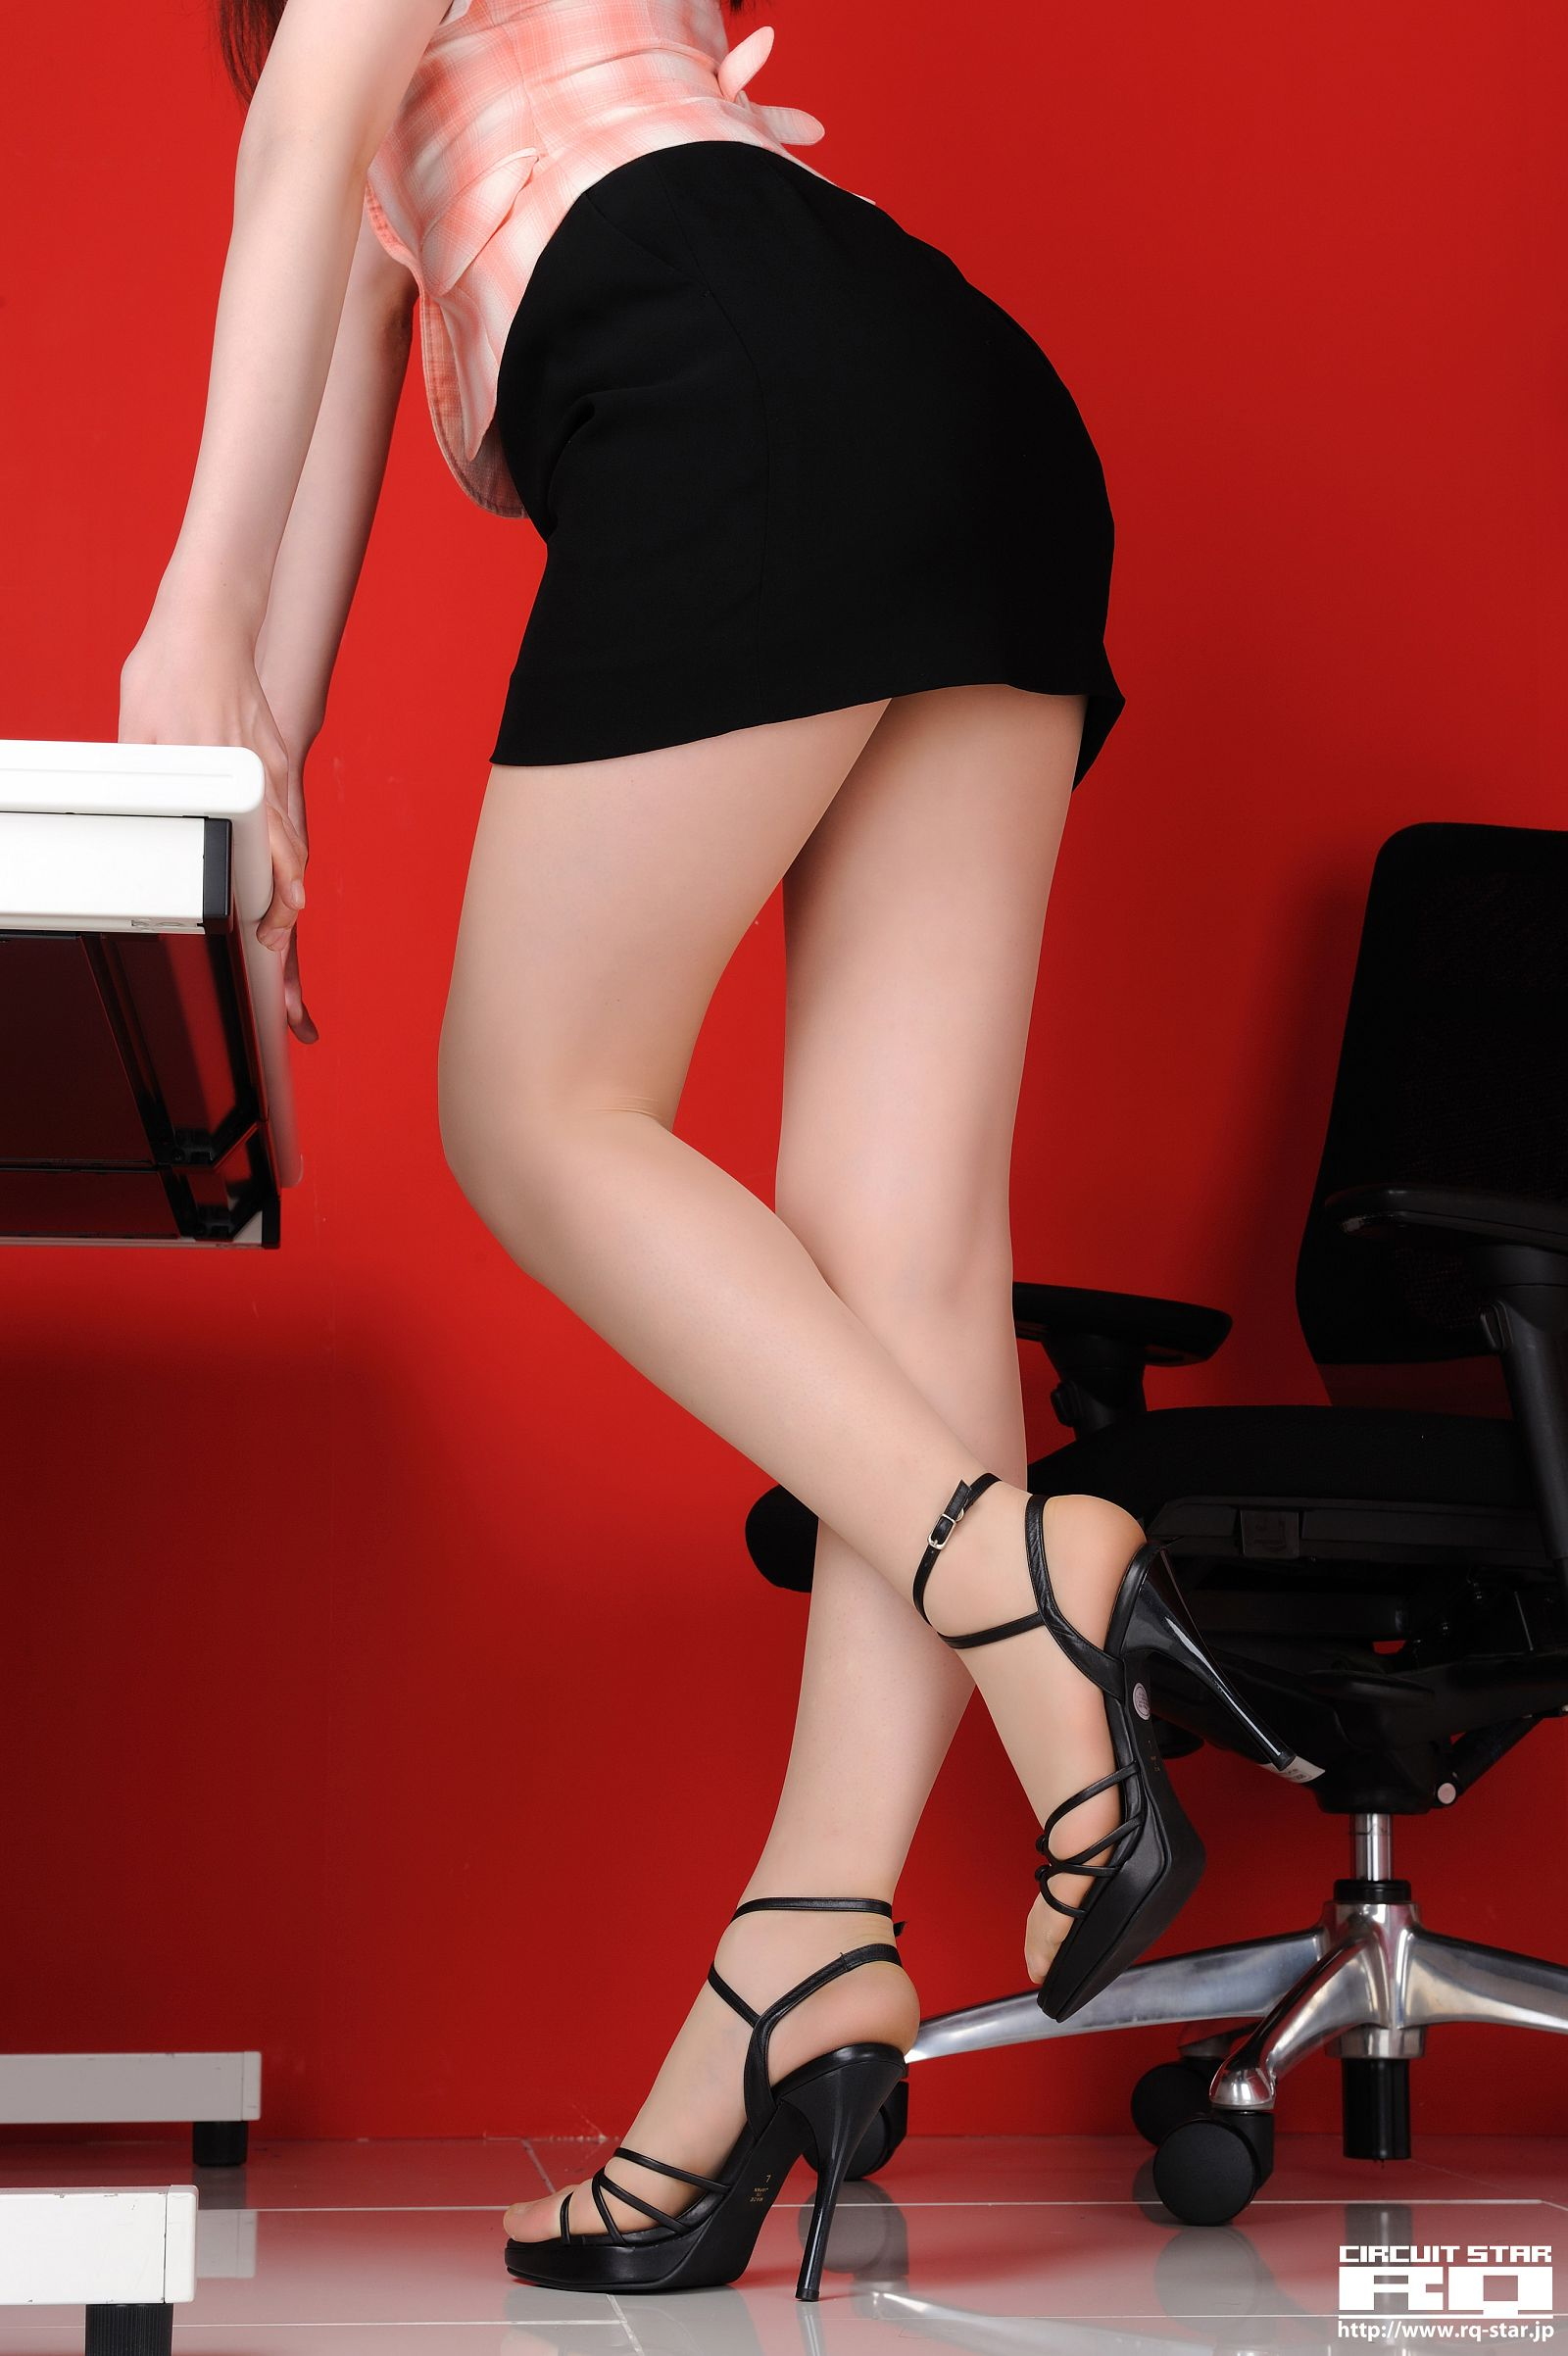 [RQ STAR美女] NO.00566 Eri Tomoki 友木えり Office Lady[77P] RQ STAR 第4张